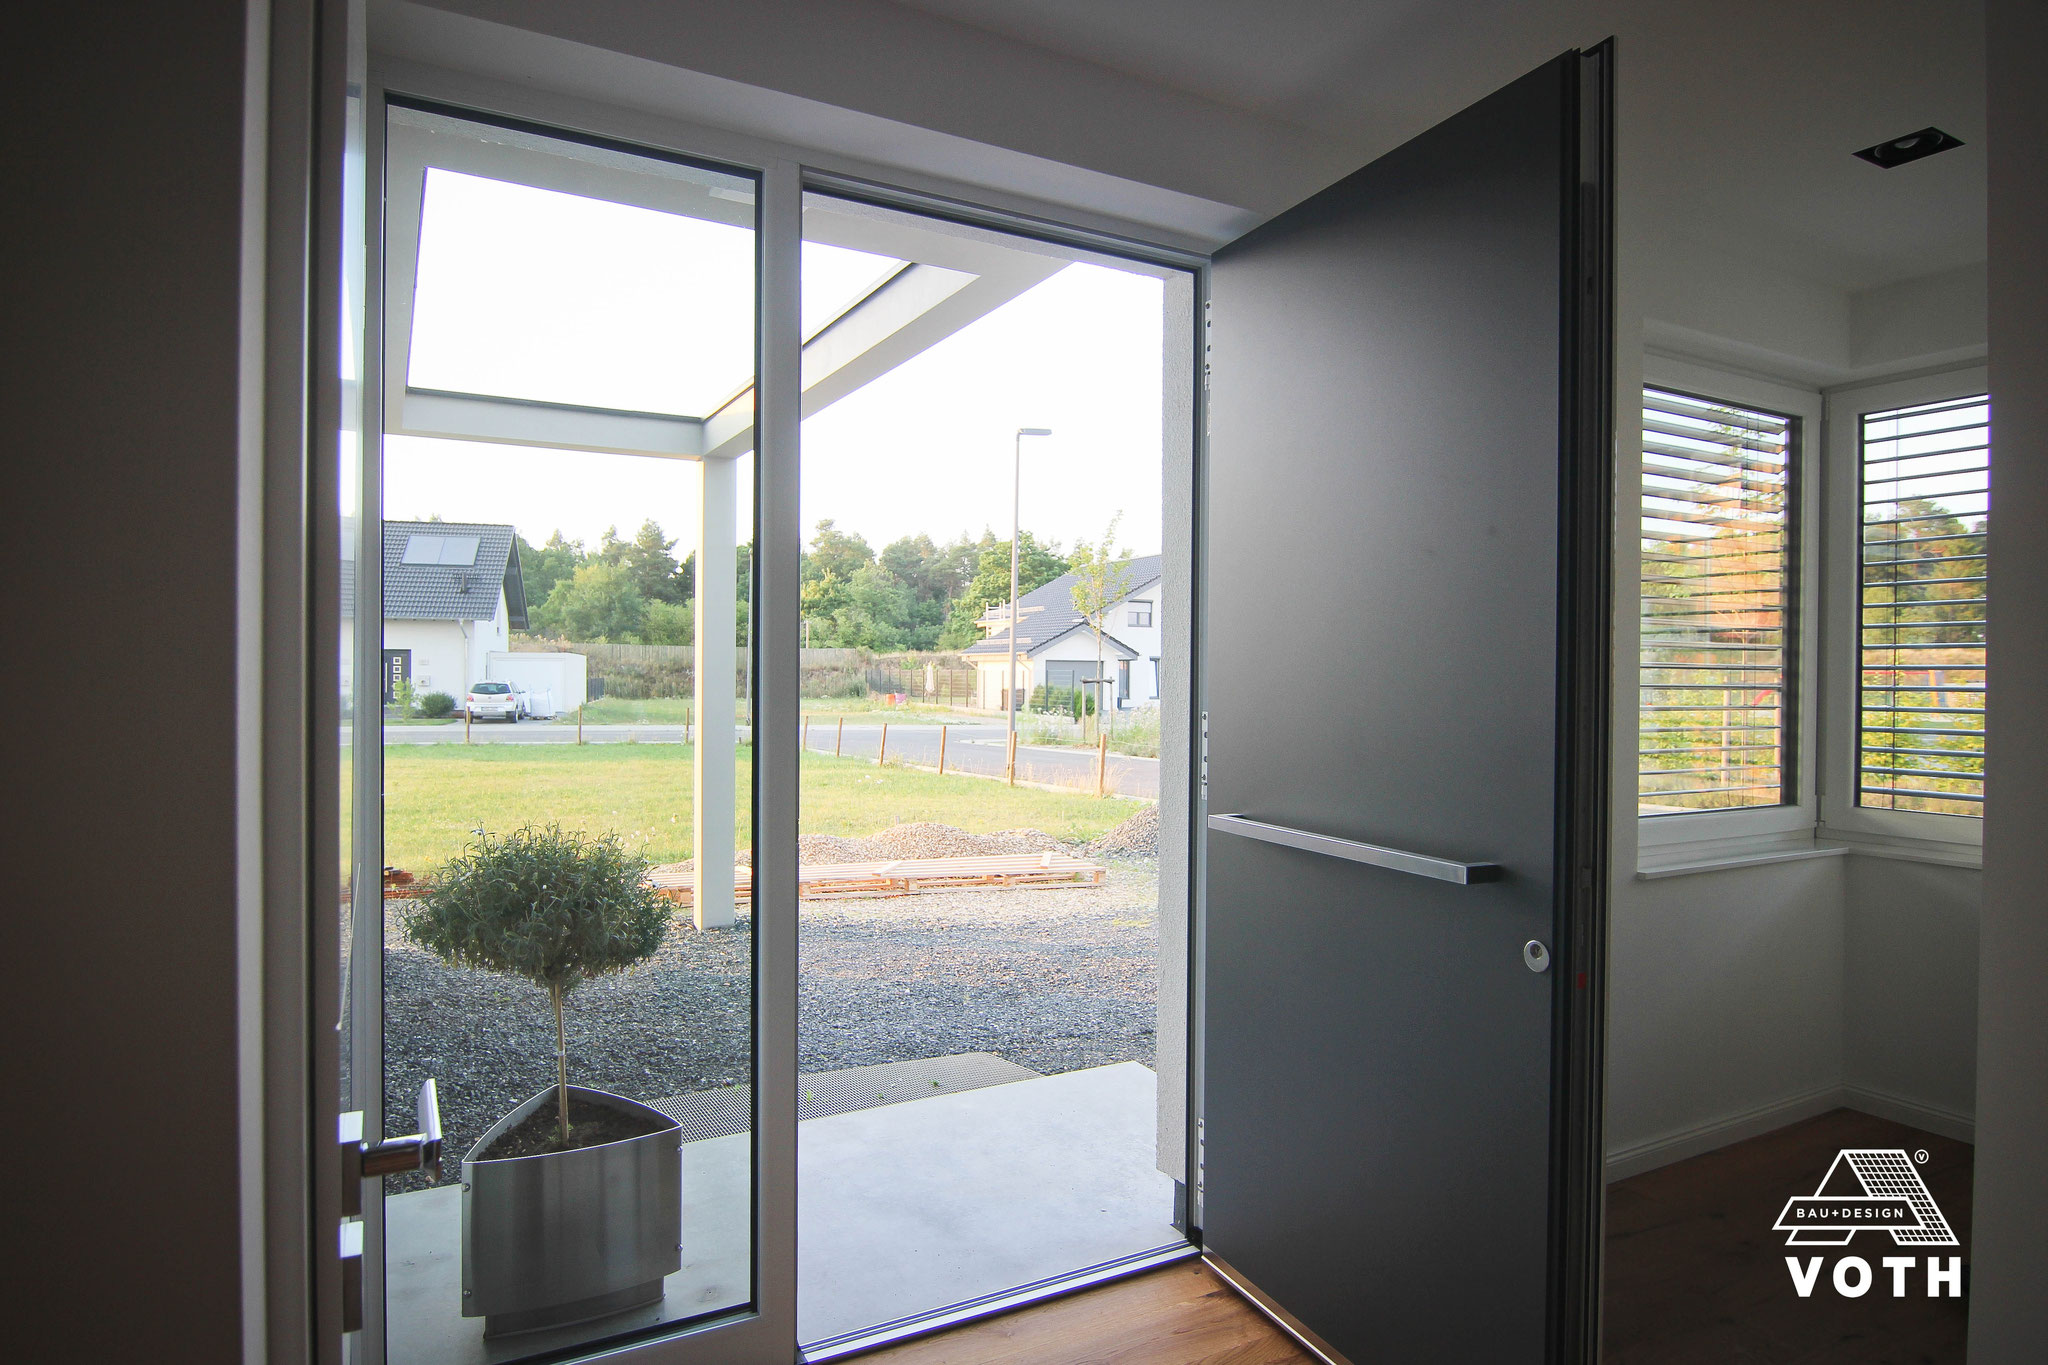 Aluminium Haustüren bei Erftstadt kaufen